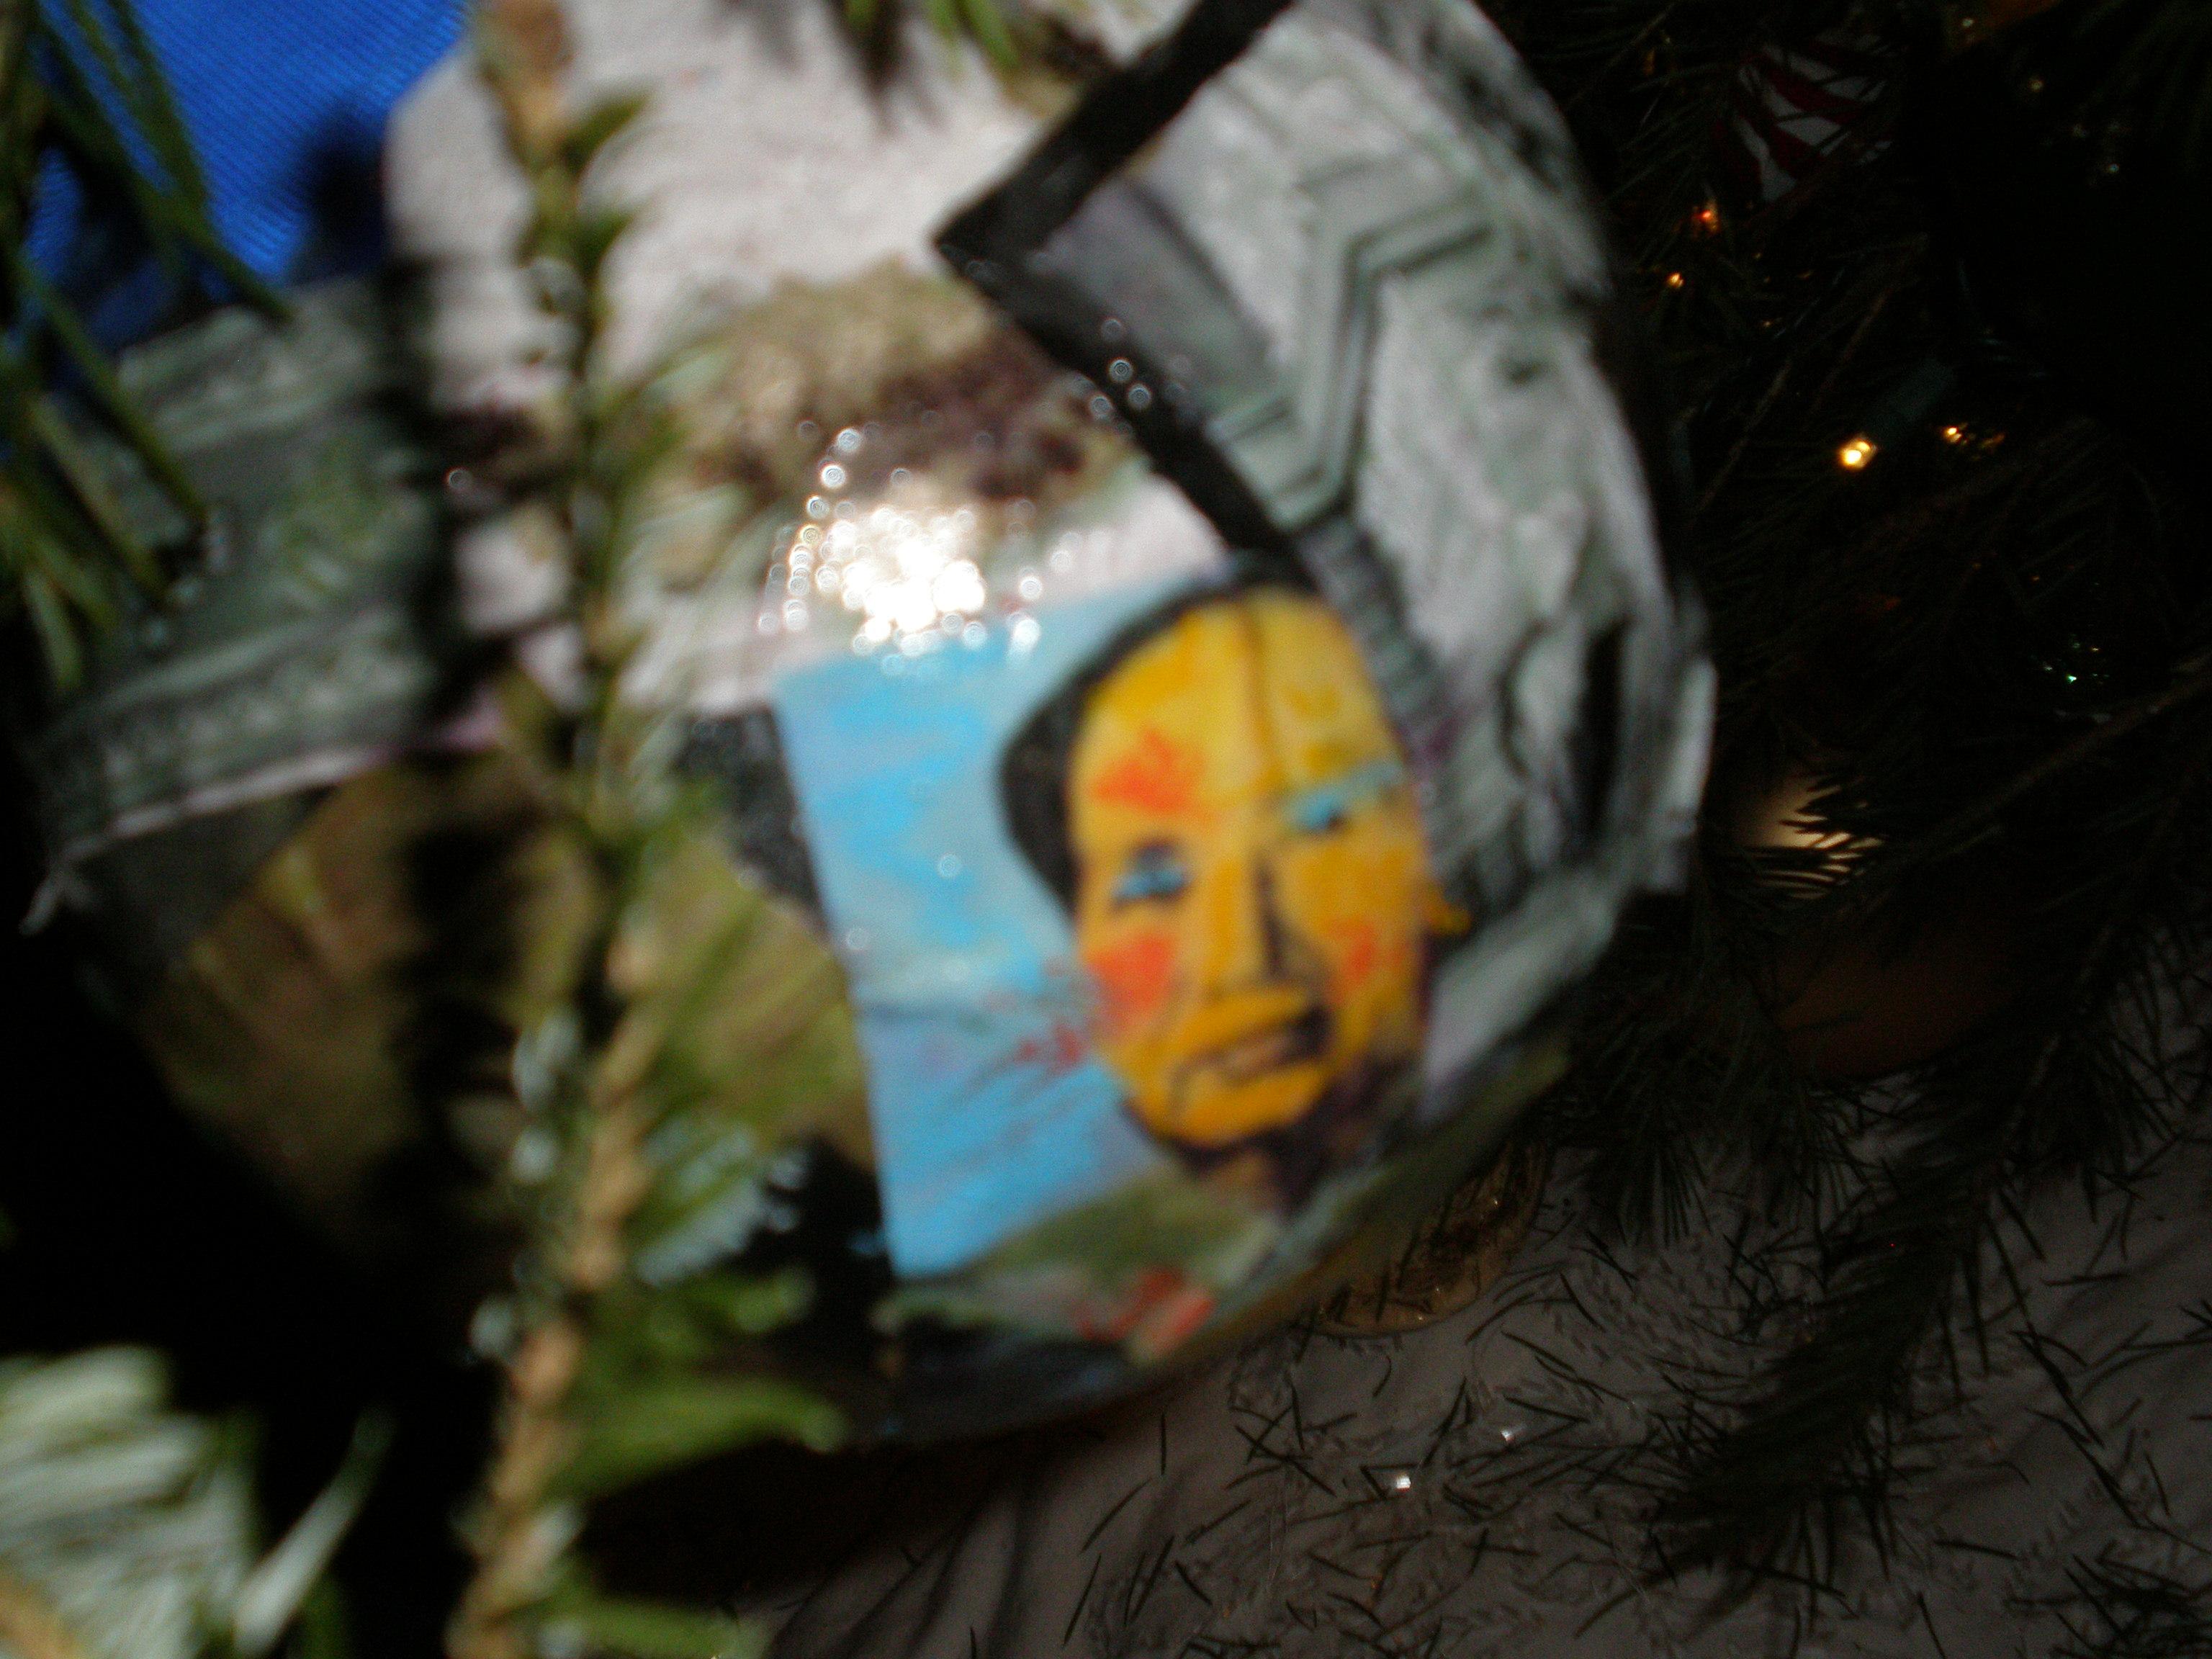 The Obamas\' Hacky-Tacky White House Christmas Tree | Nice Deb